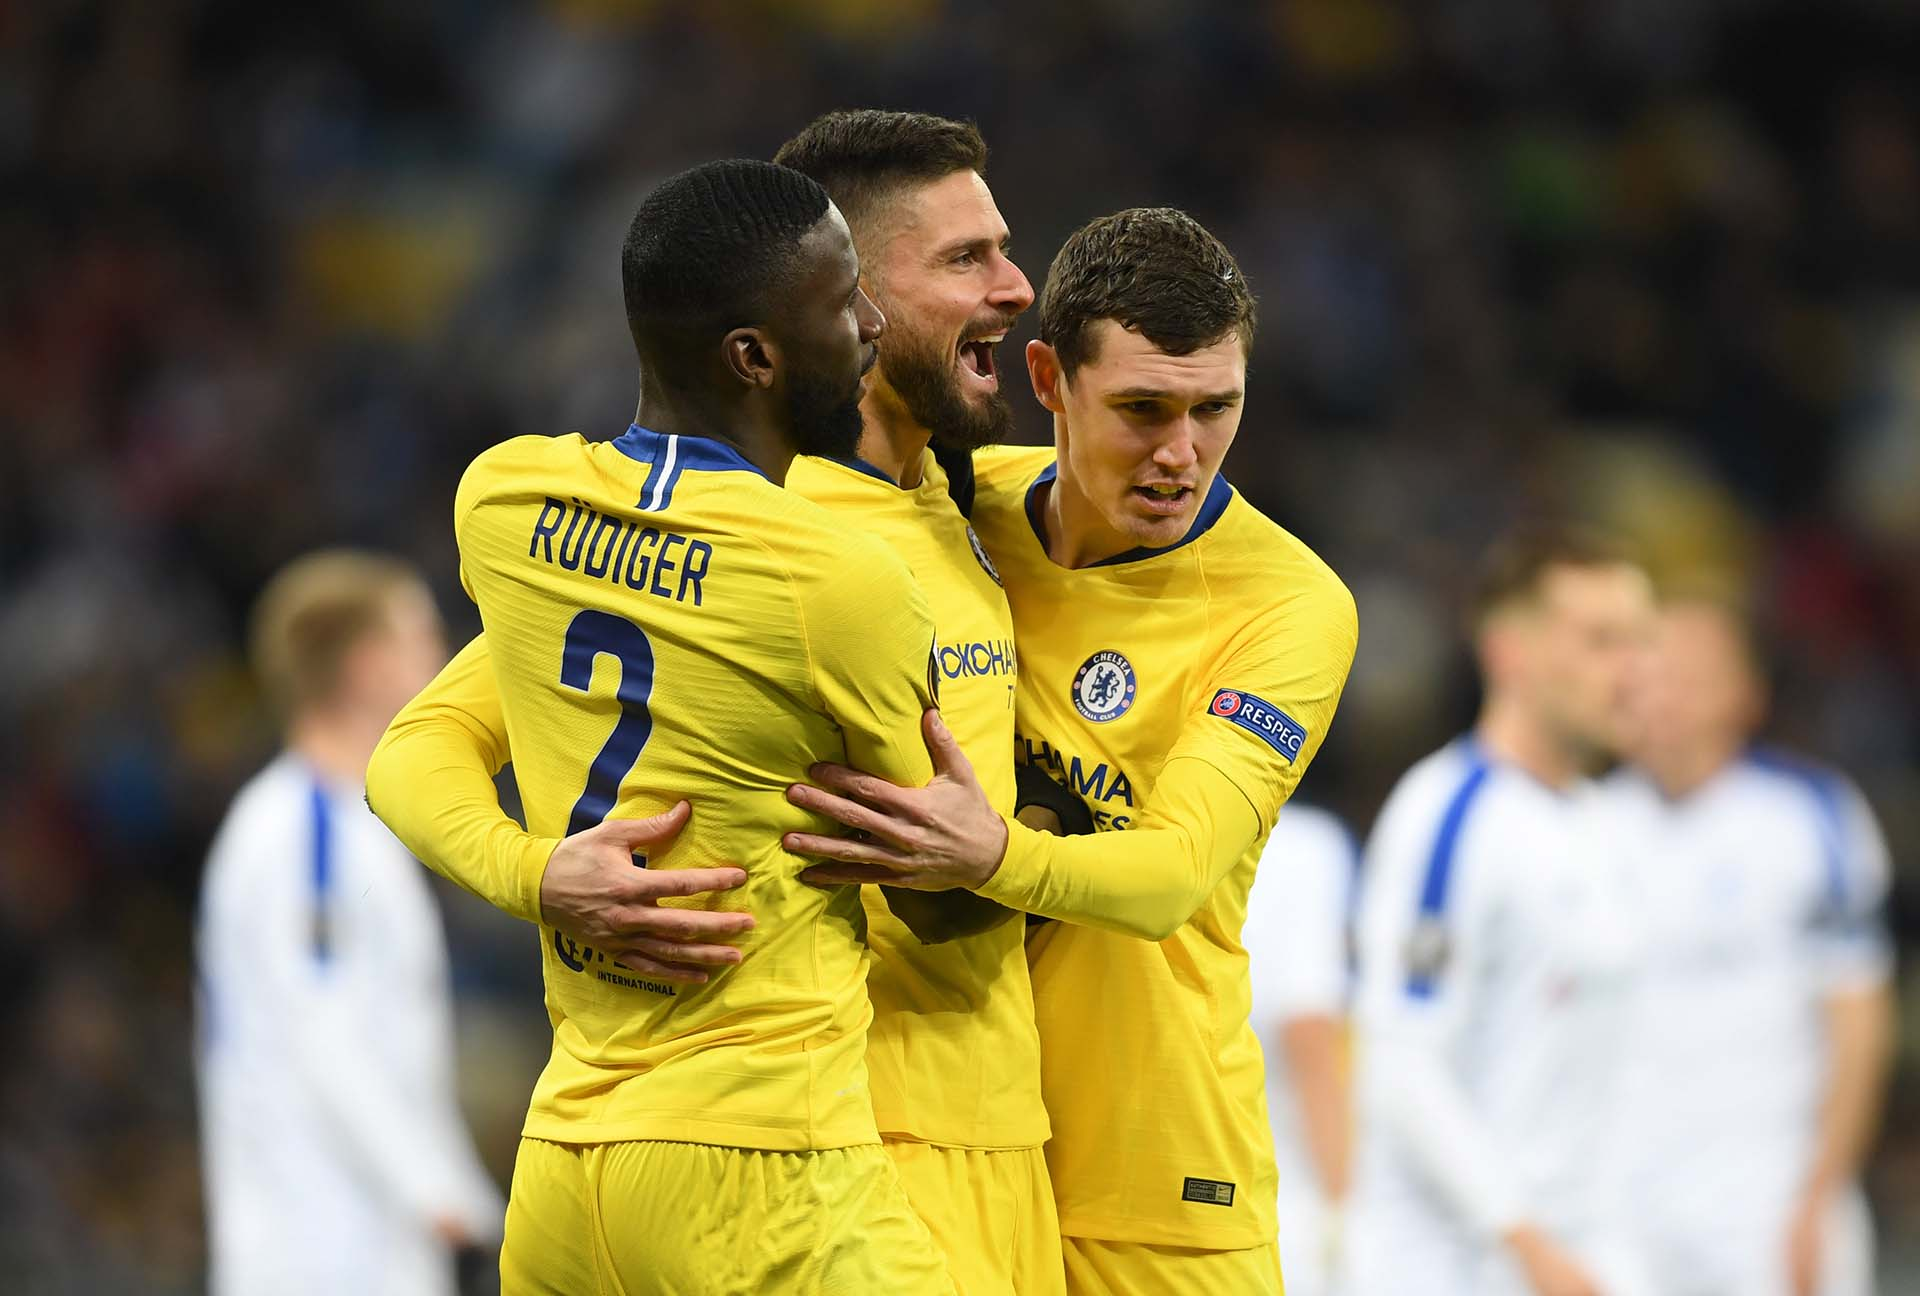 Dynamo Kyjev – Chelsea Facebook